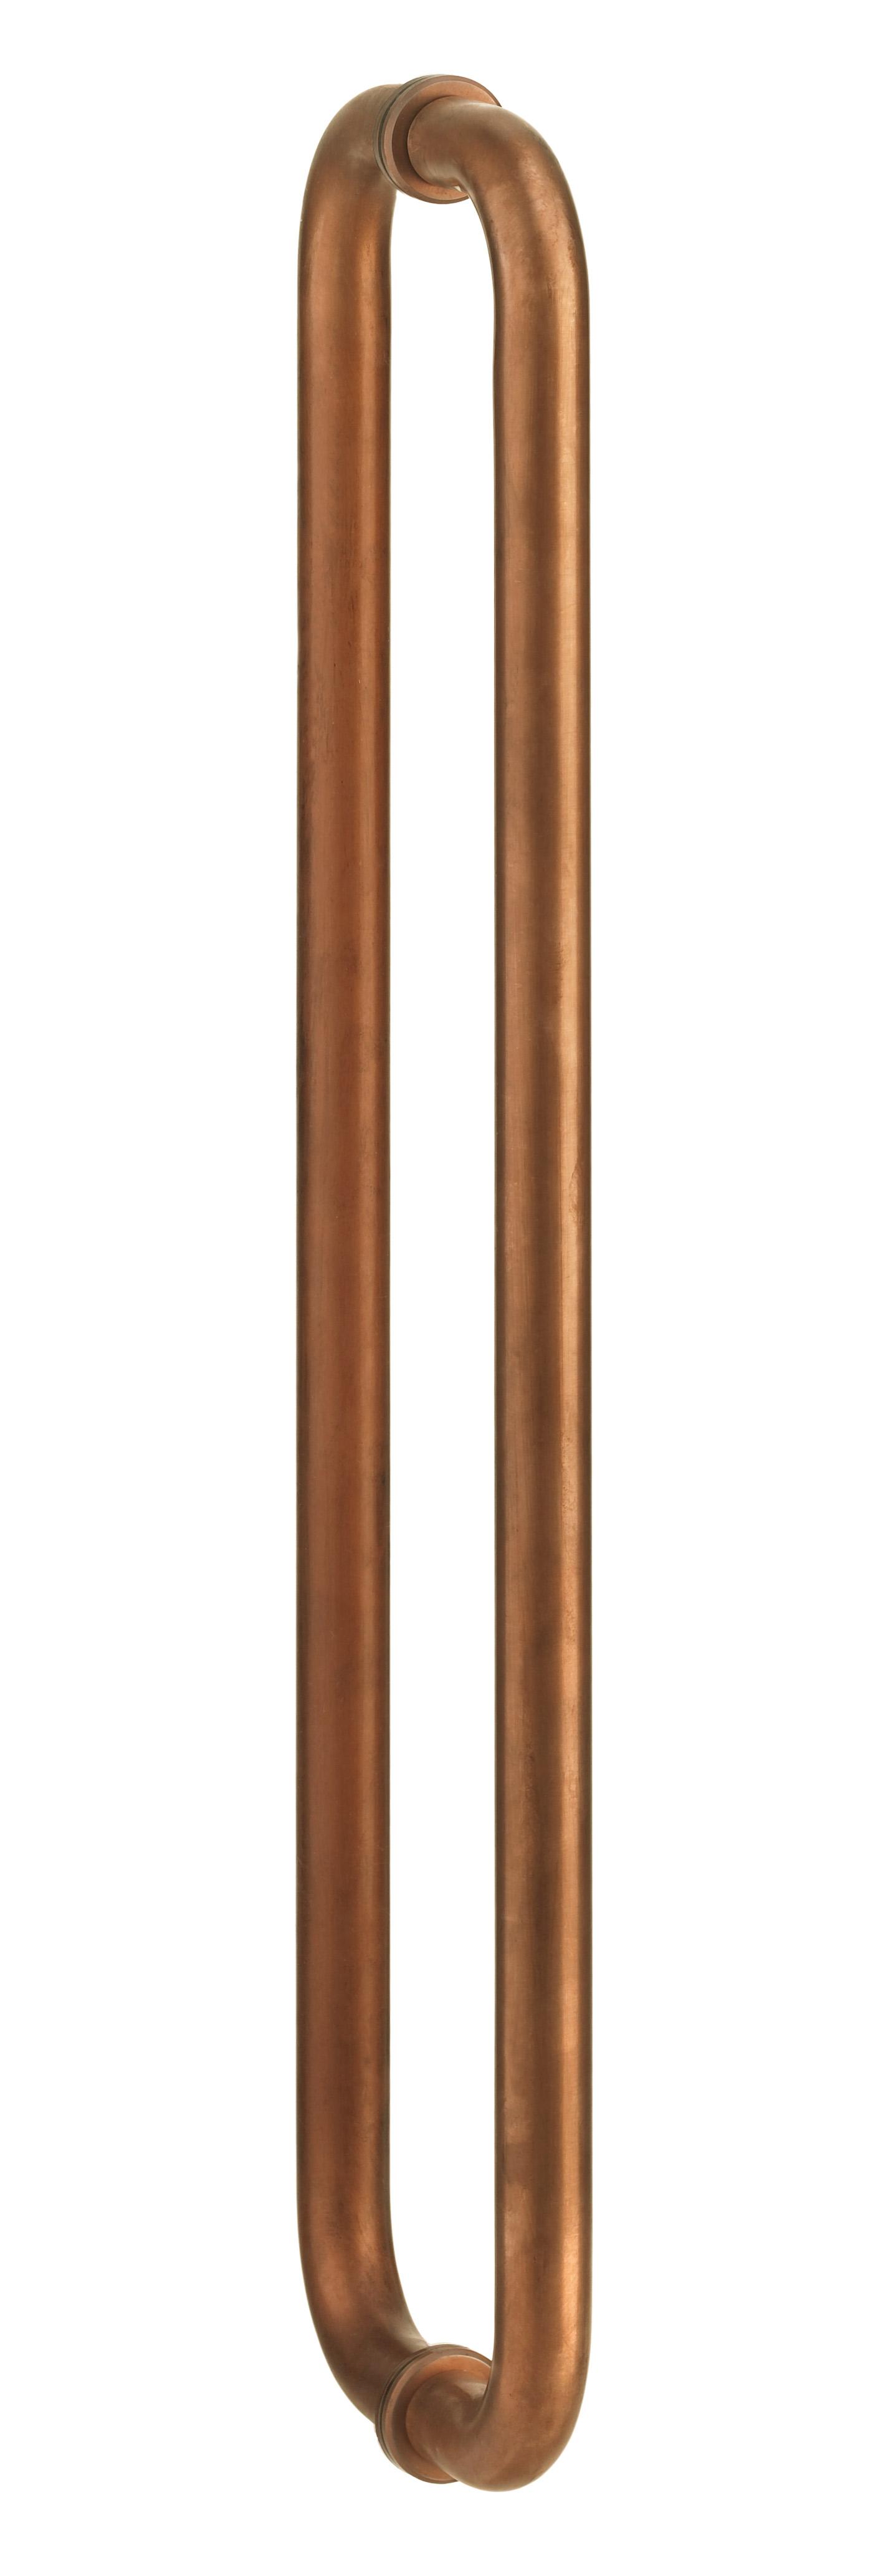 Manere, silduri din bronz FSB - Poza 77